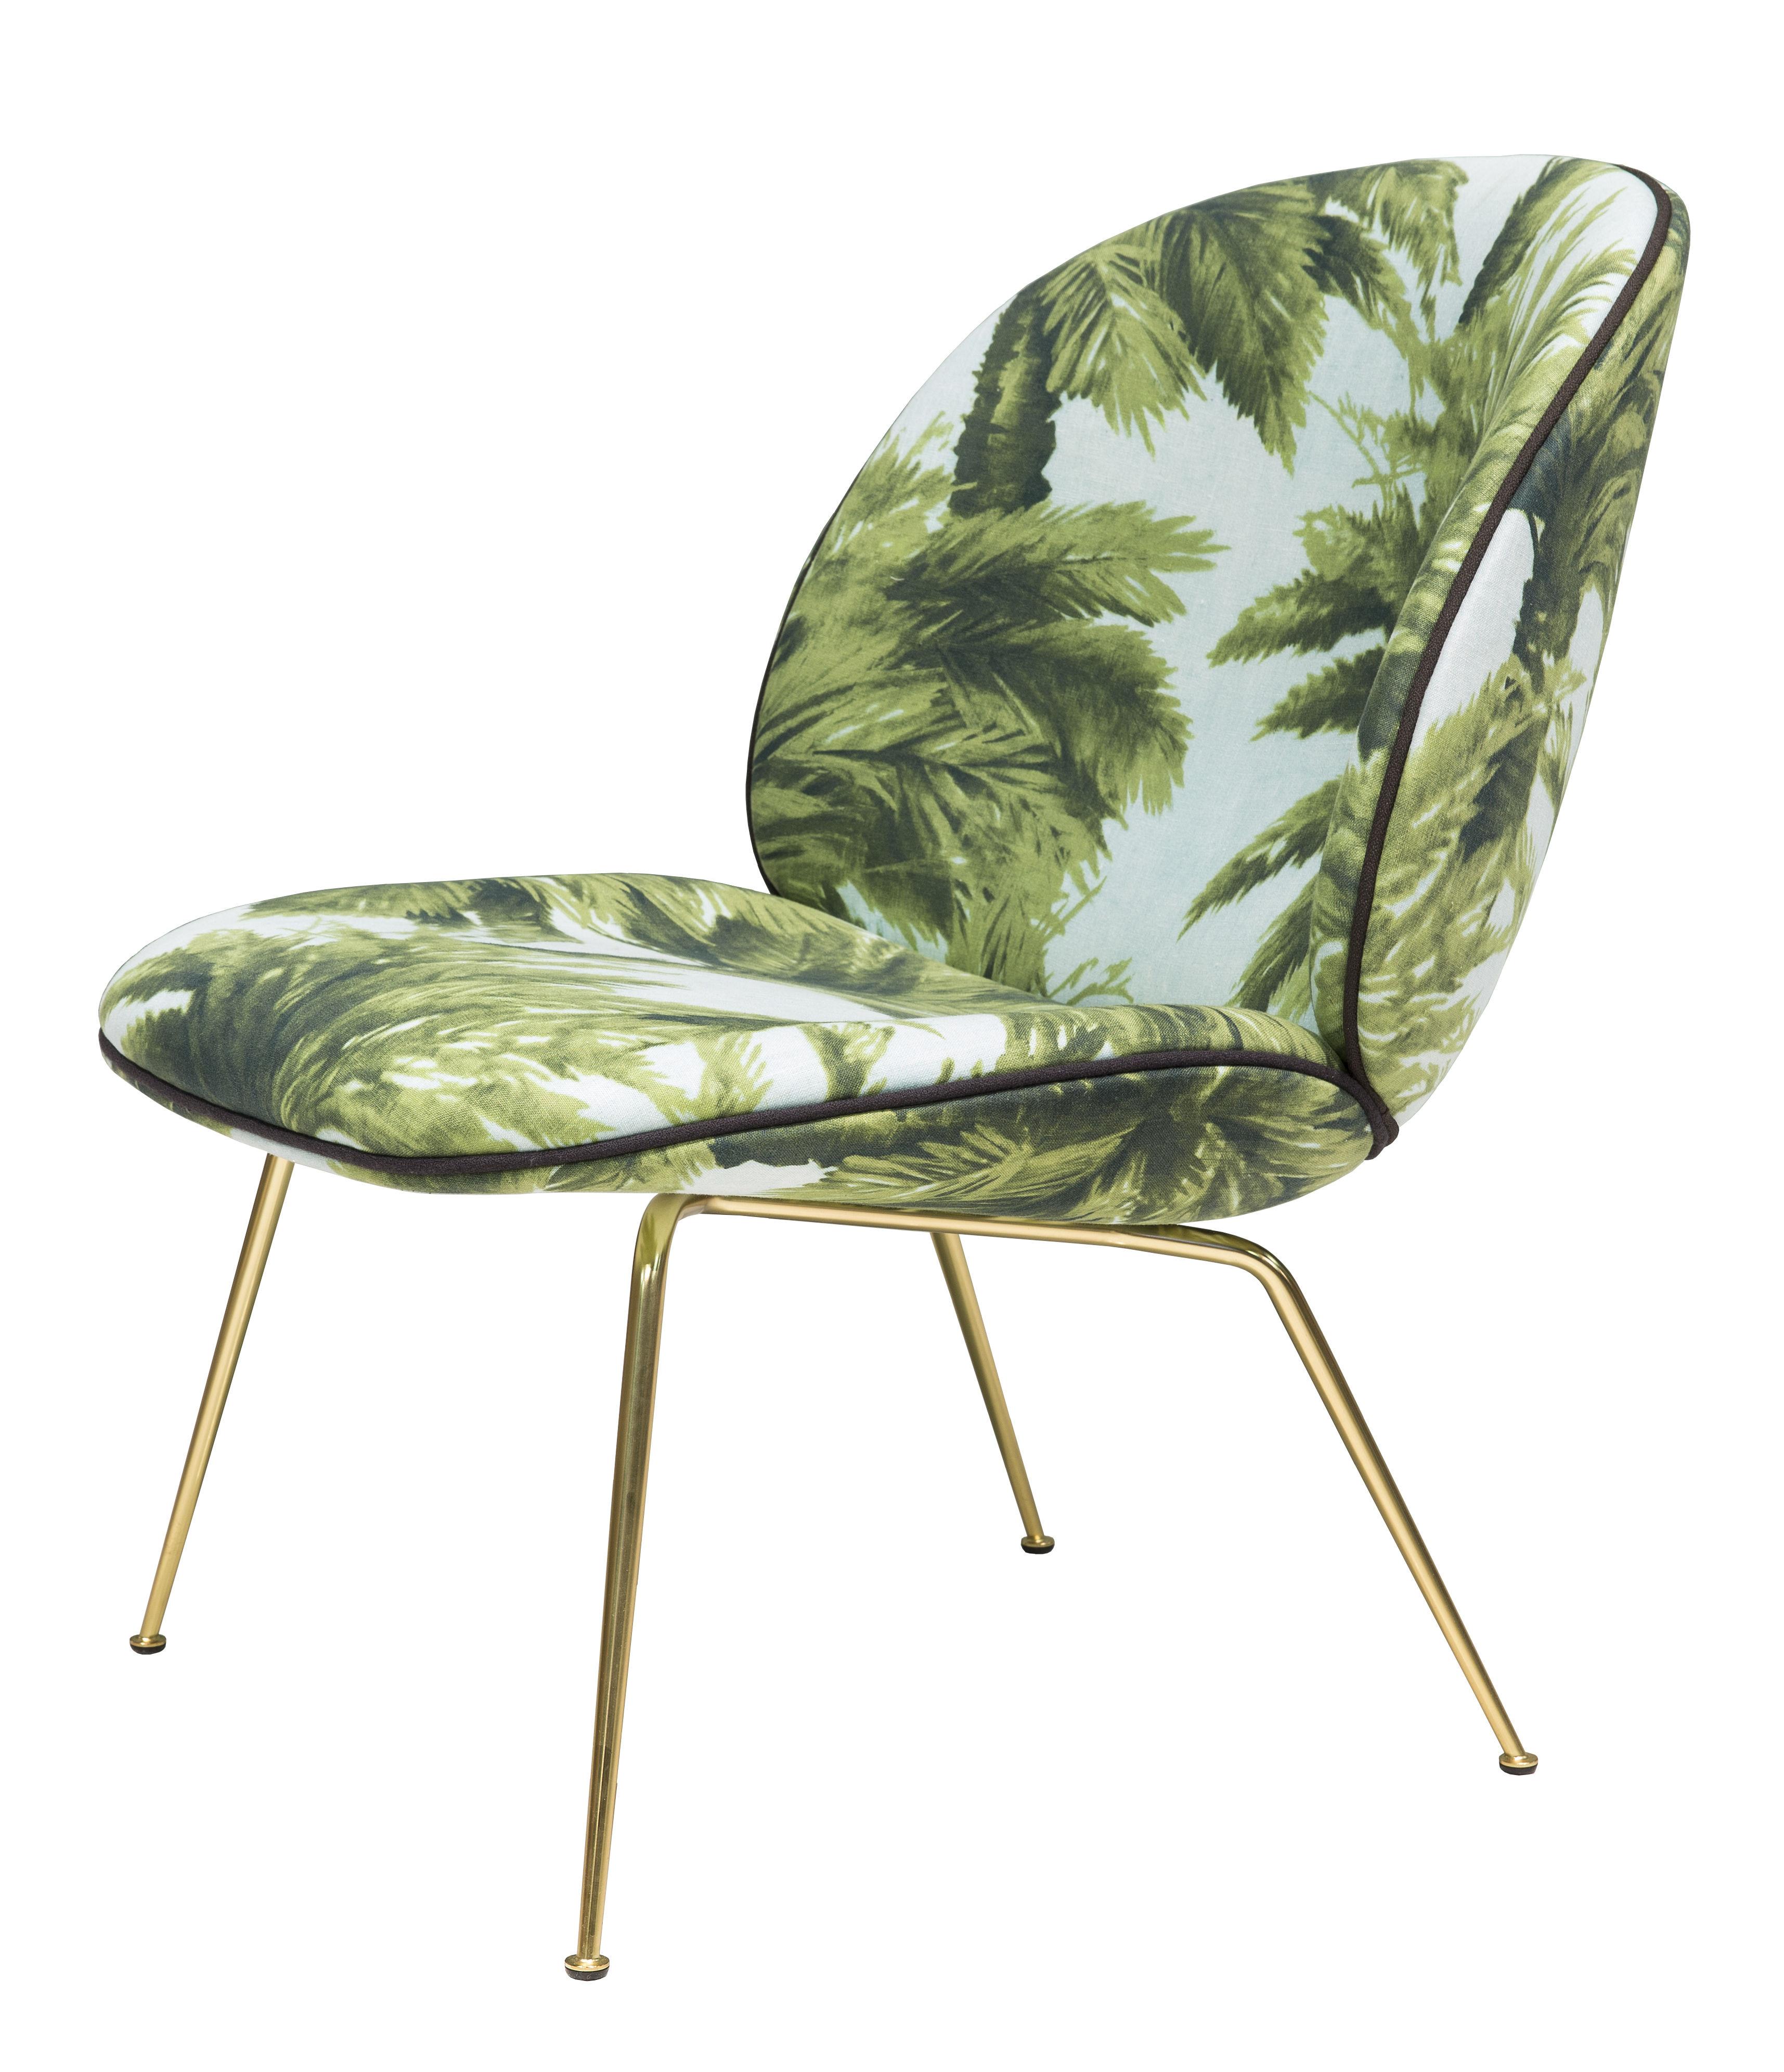 Arredamento - Poltrone design  - Poltrona bassa Beetle - / Gamfratesi - Tessuto di Gubi - Motivi palme verdi / Gambe ottone - Acier plaqué laiton, Espanso, Tessuto